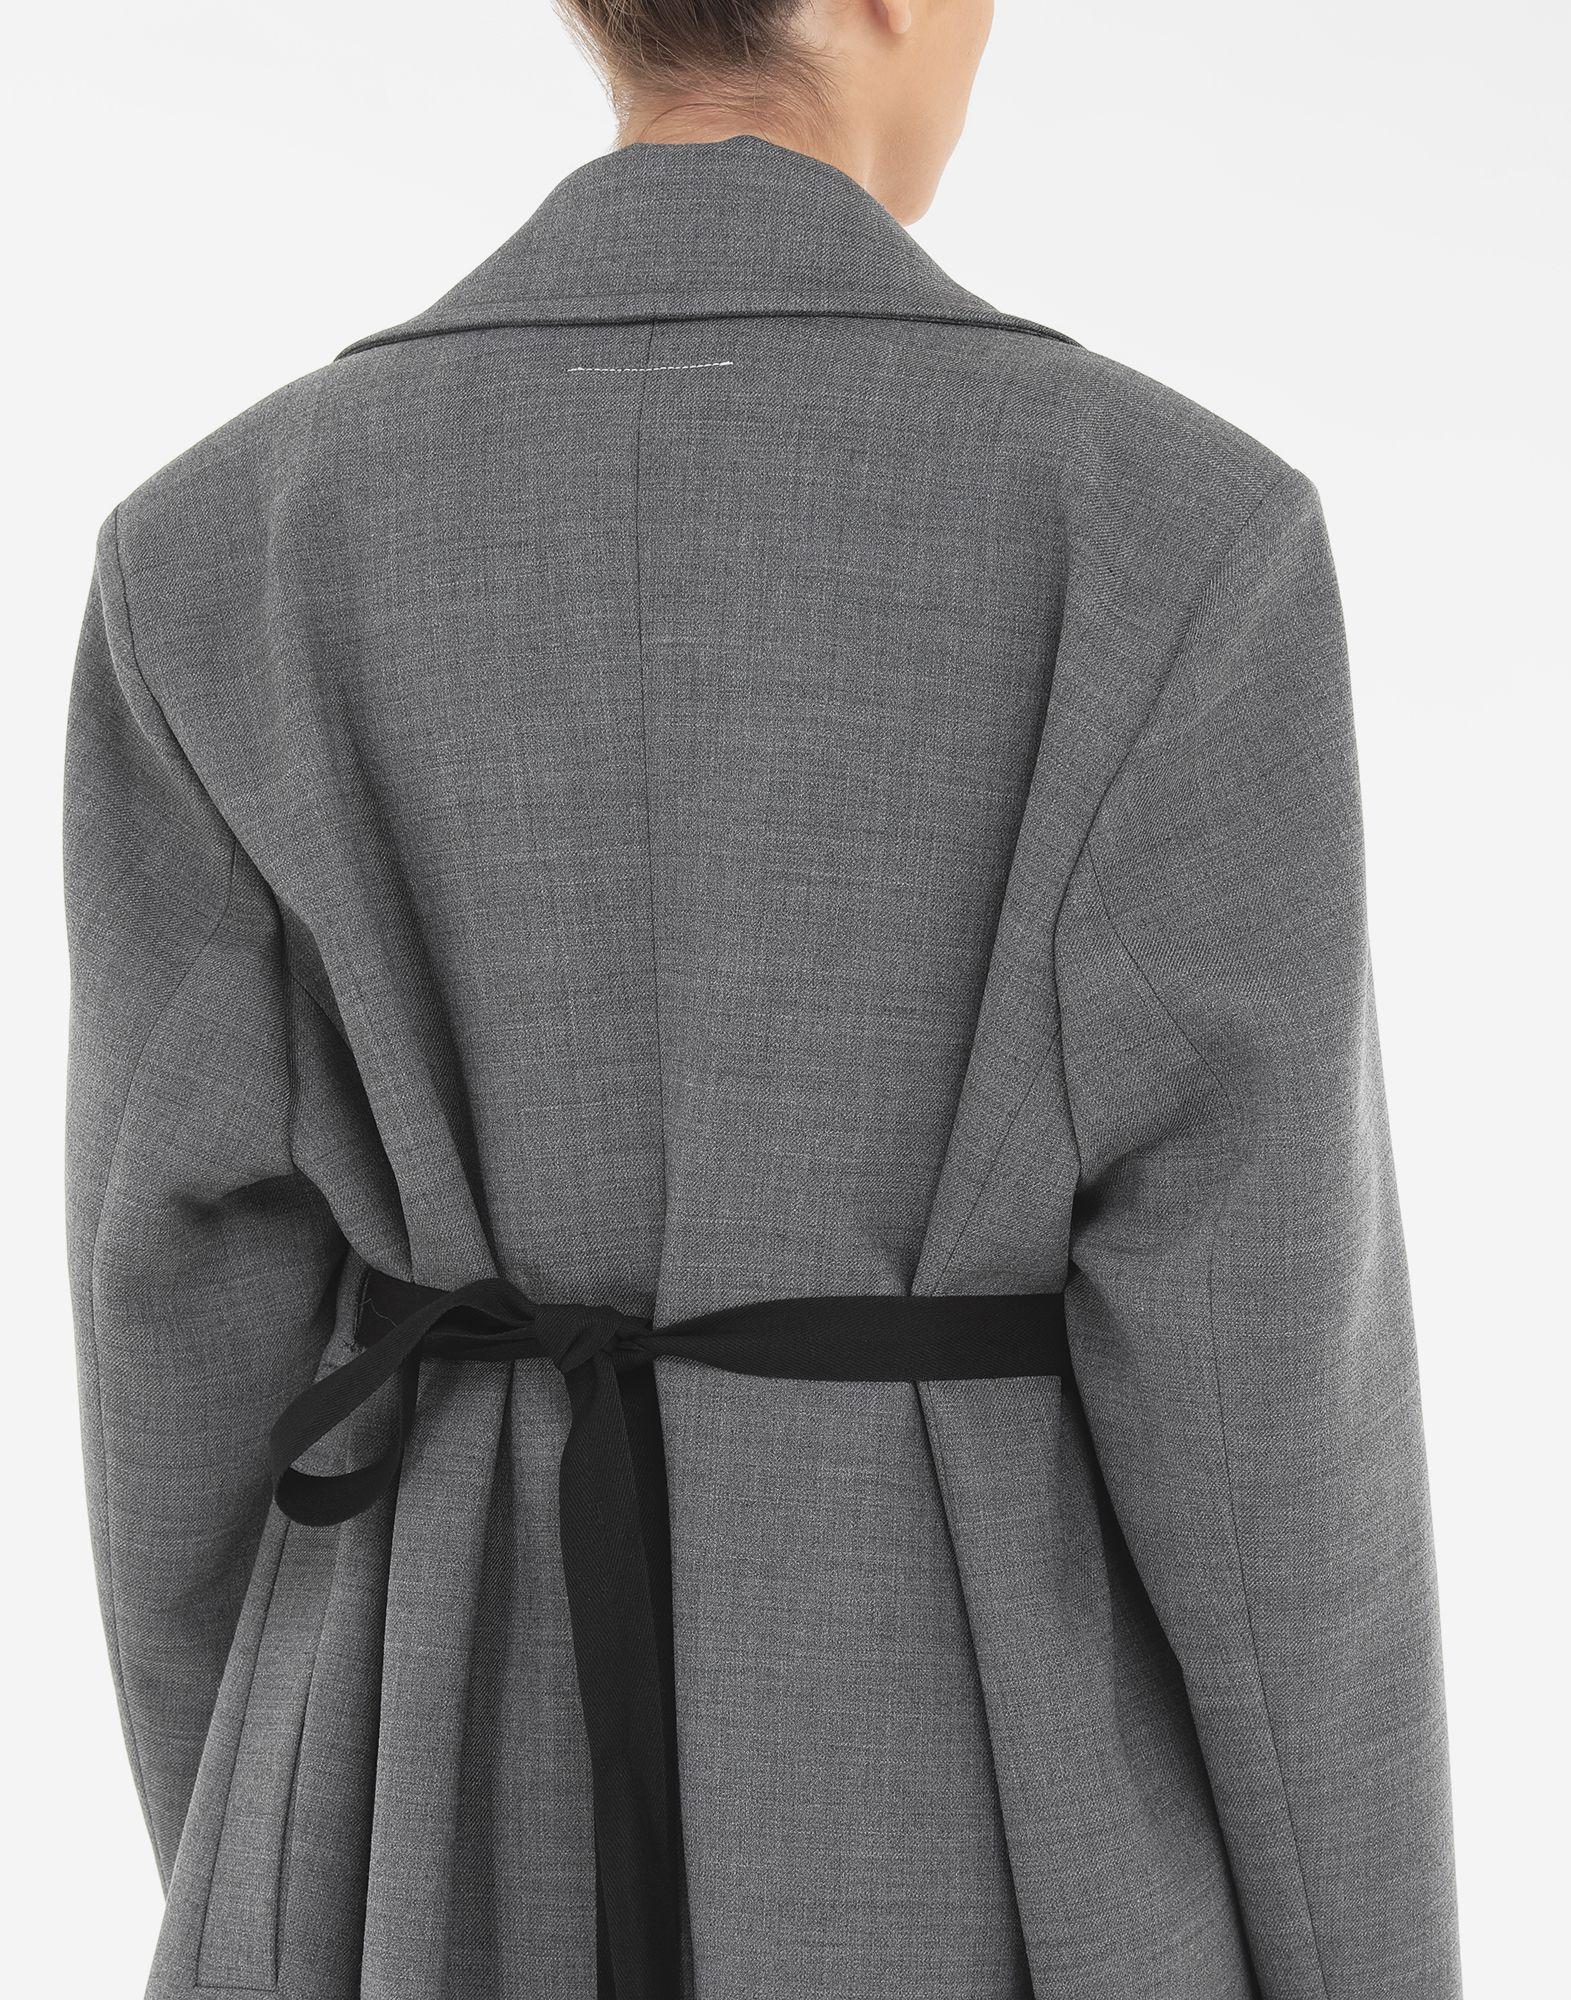 MM6 MAISON MARGIELA Techno-wool coat Coats and Trenches Woman b